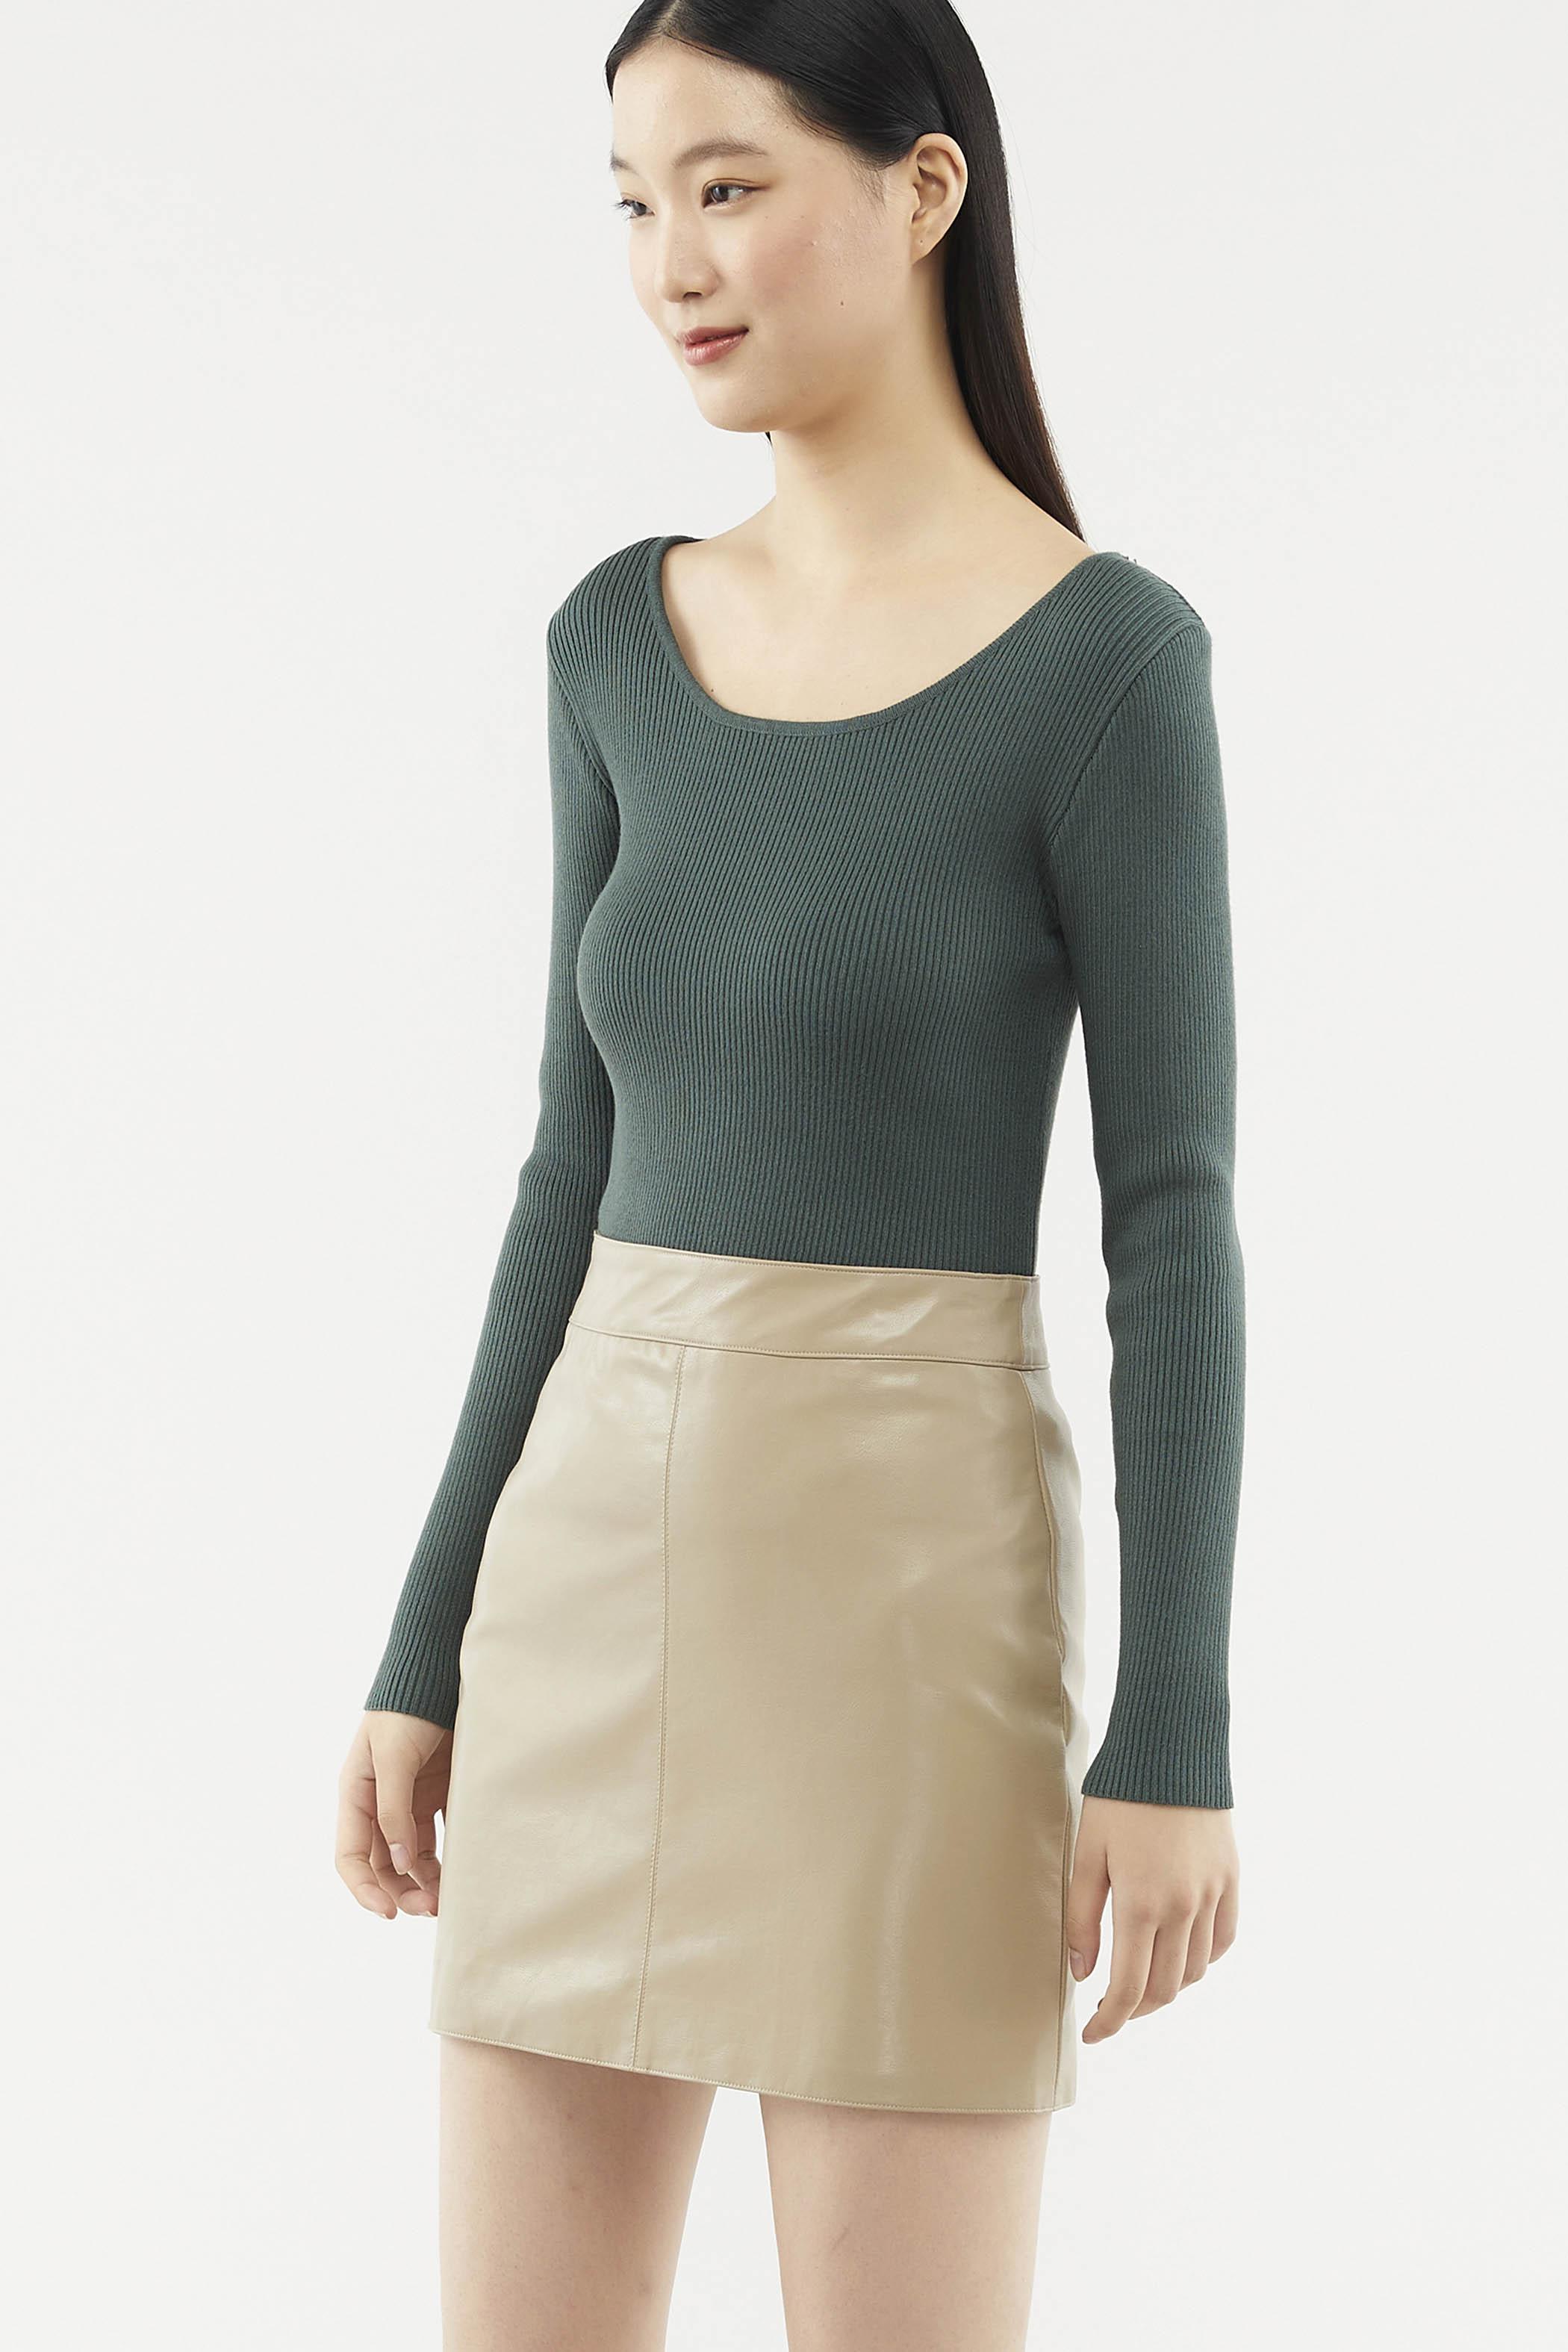 Valerie Long-sleeve Knit Top